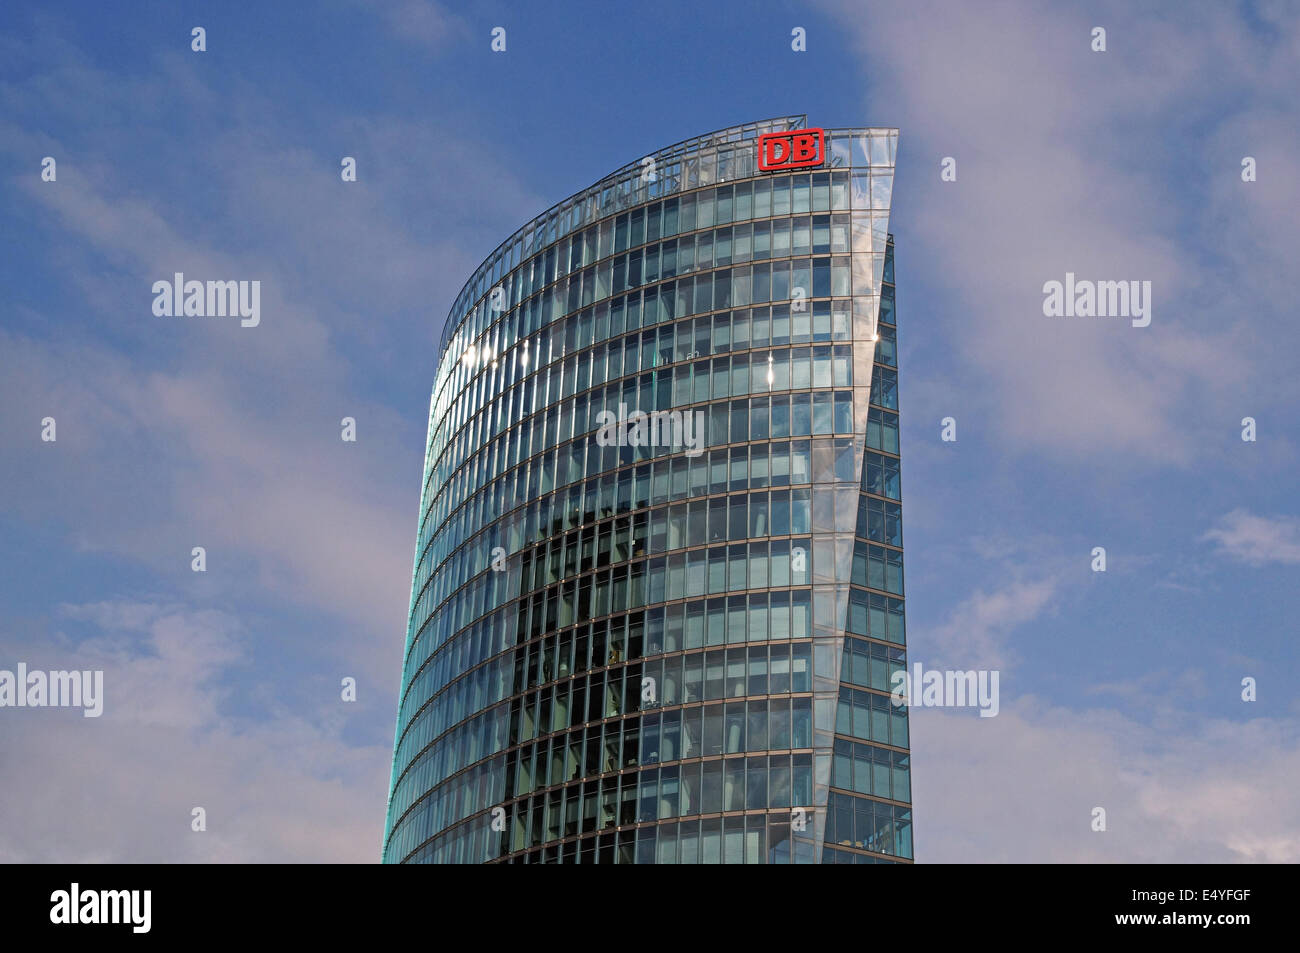 DB Tower Berlin Germany - Stock Image